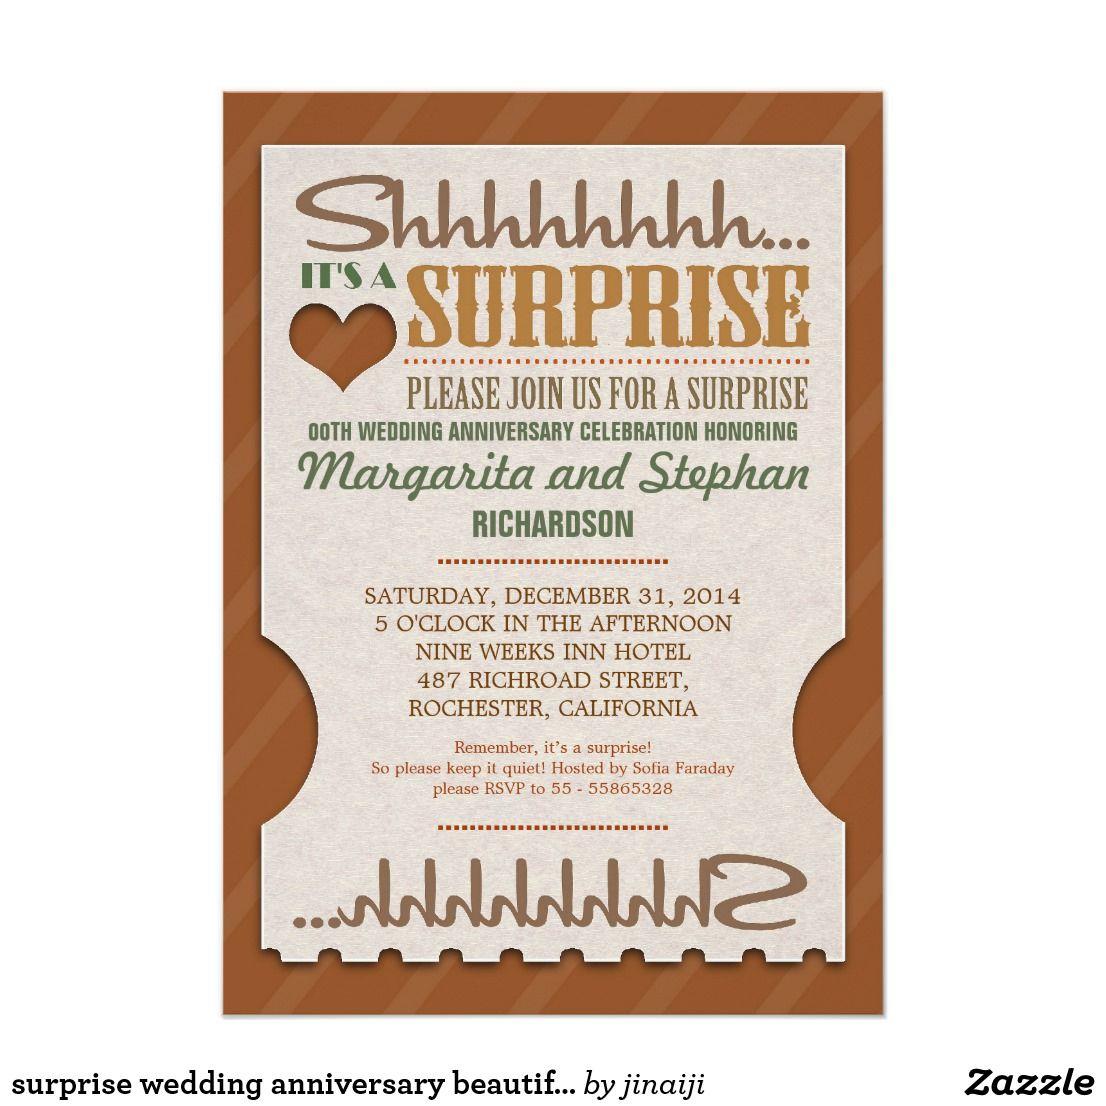 Surprise Wedding Anniversary Beautiful Invitations Vintage Wedding